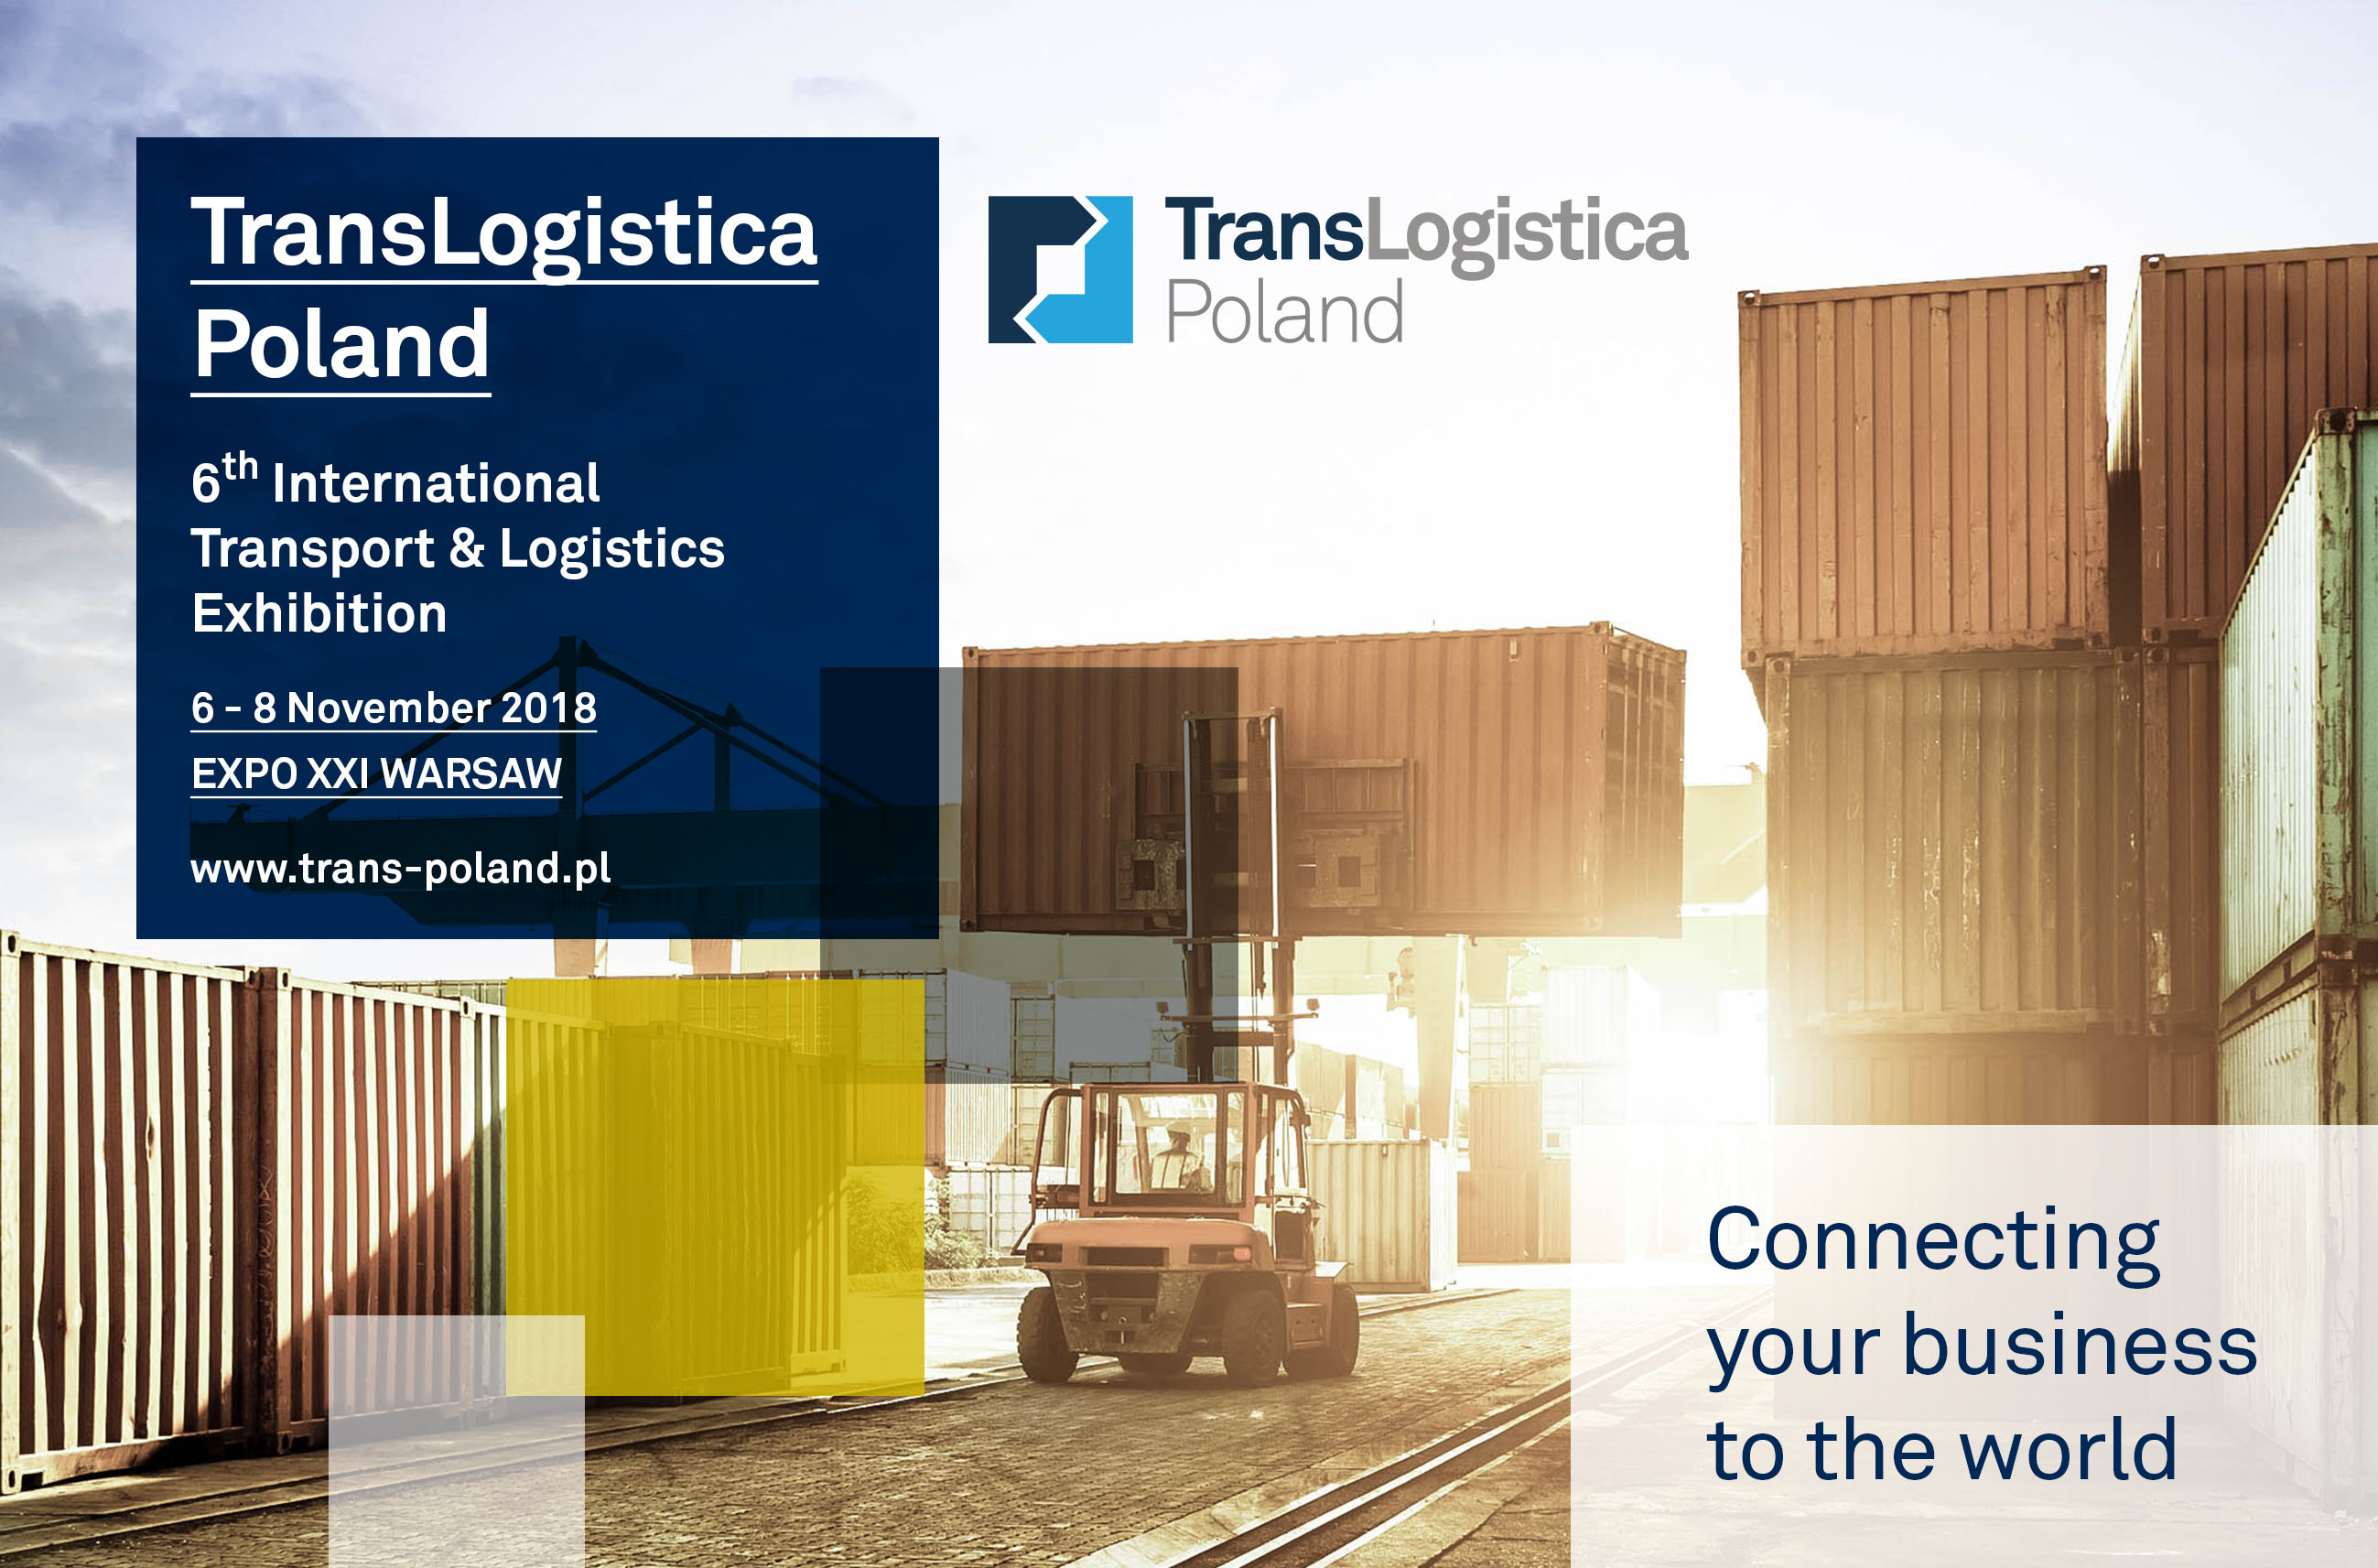 6th International Transport & Logistics Exhibition TransLogistica Poland – Transport&Logistics industry meets in Warsaw (6-8 November 2018)